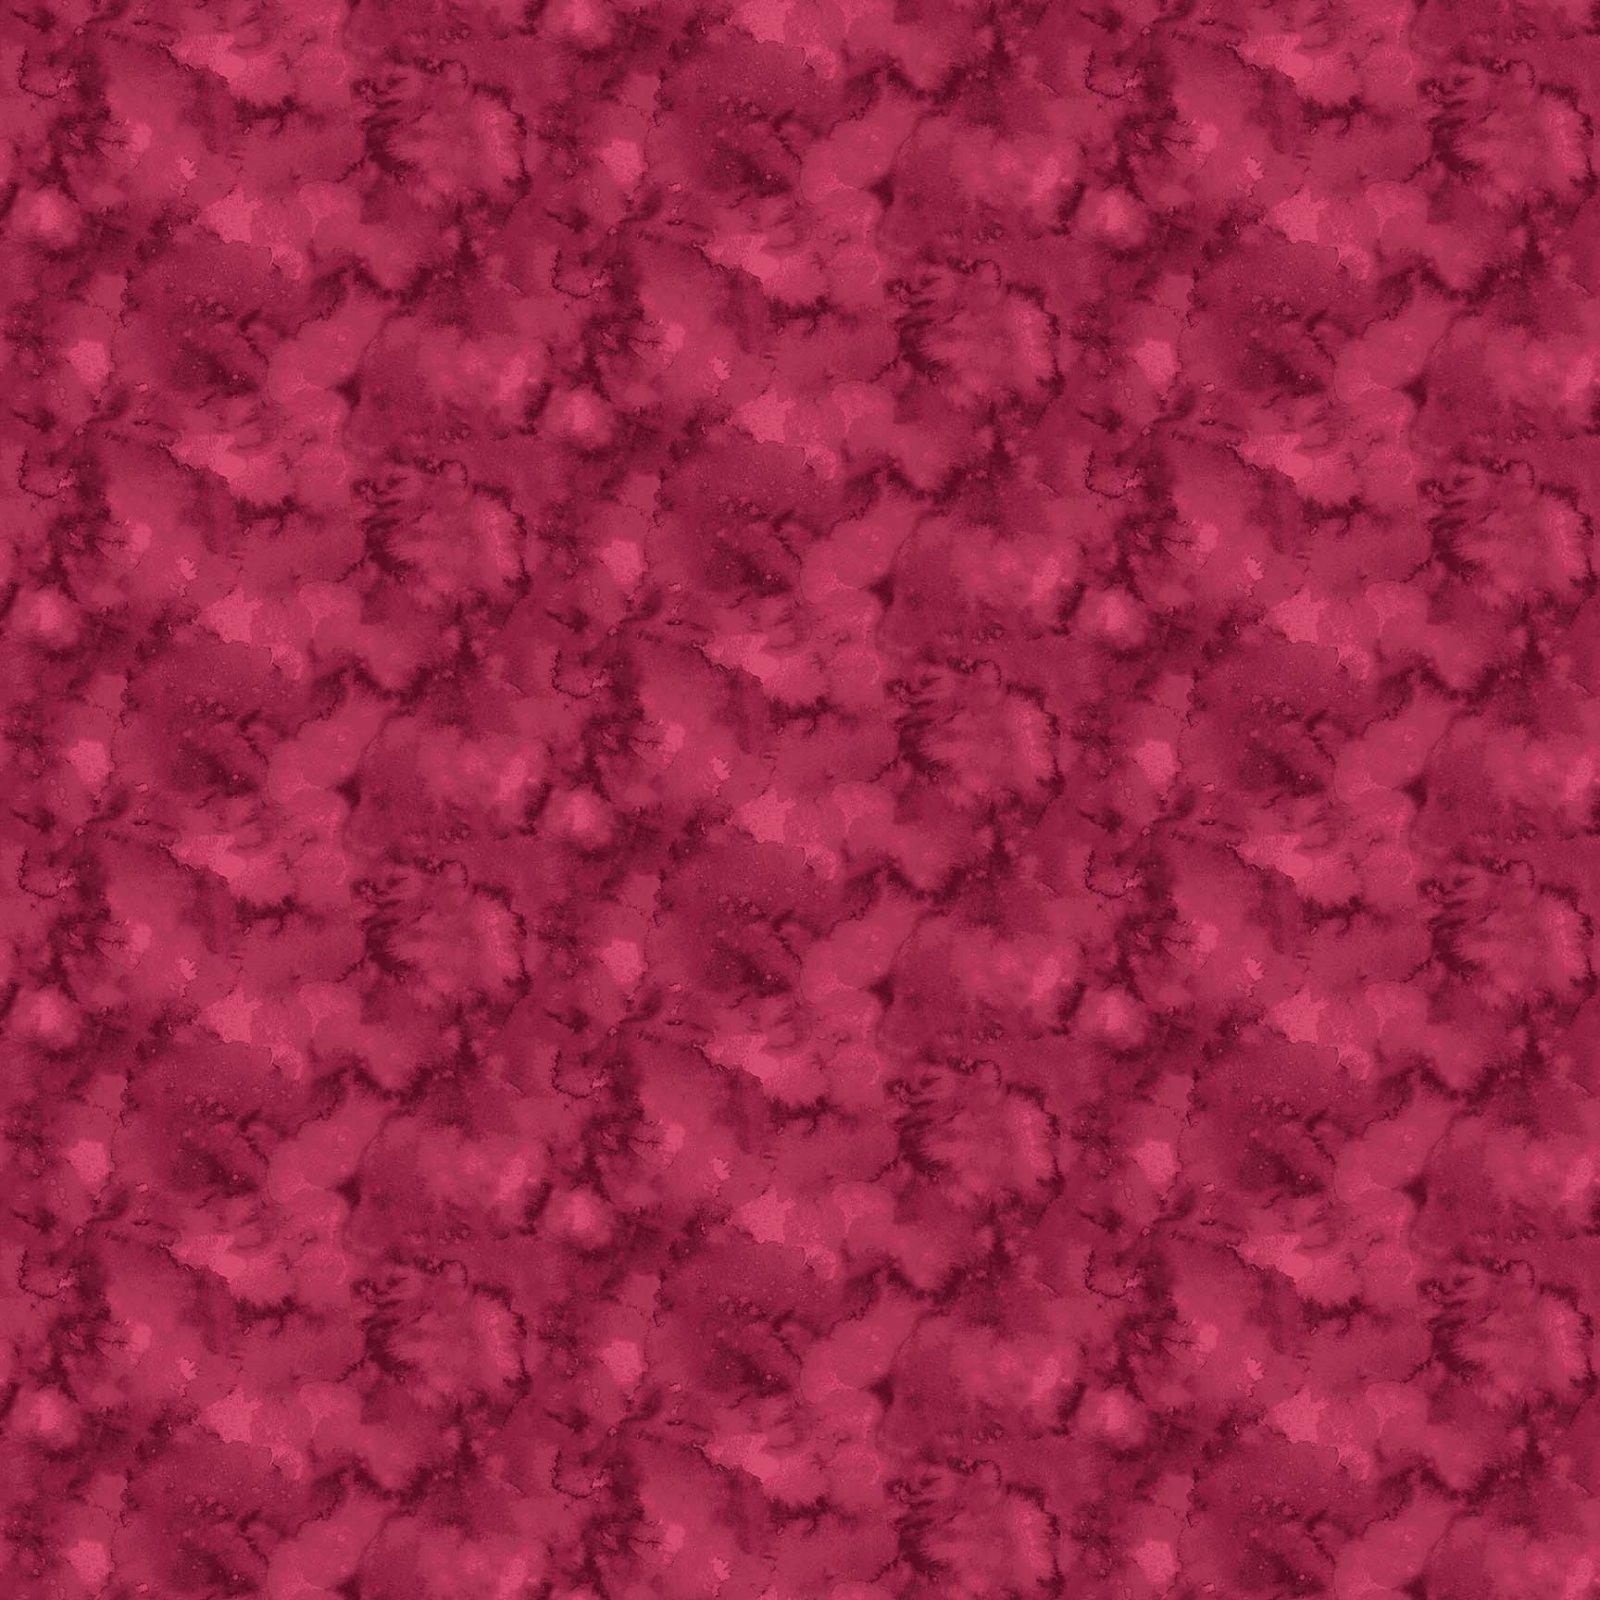 20937-28 Peony Artisan Spirit Expressions Northcott